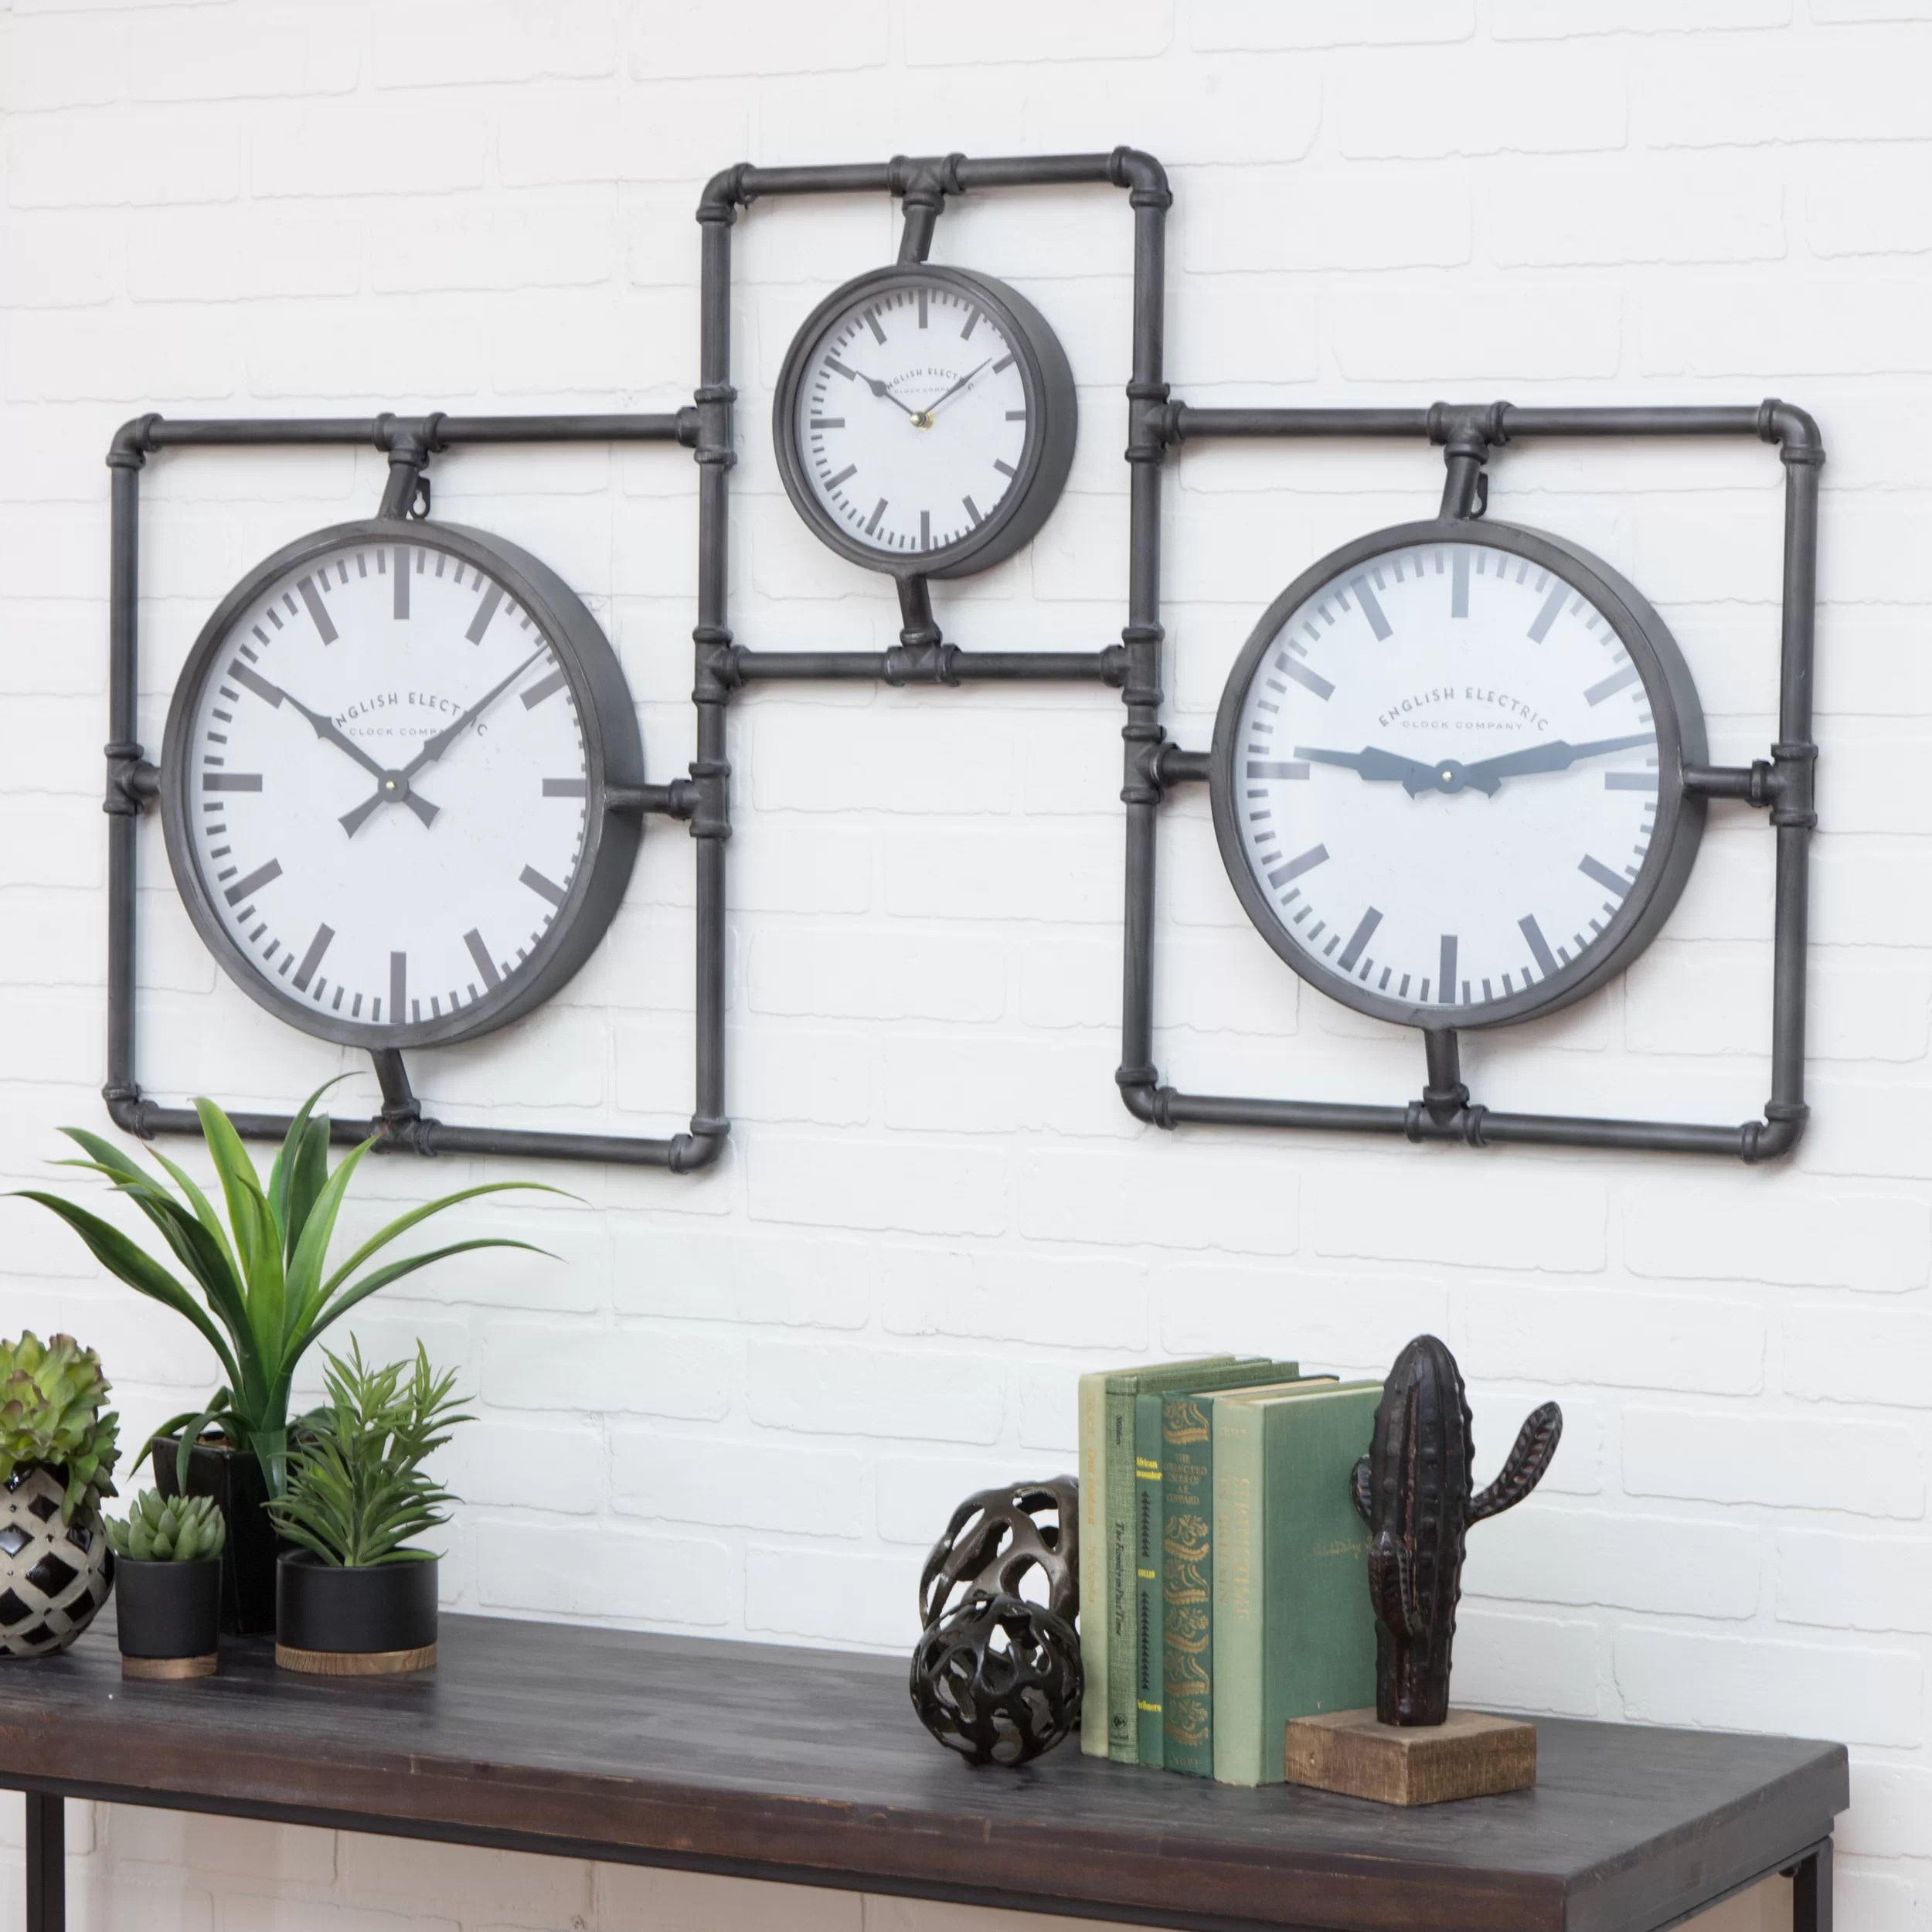 Astounding Diller Industrial 3 Face Wall Clock Industrial Wall Clock Nz Industrial Wall Clock Uk furniture Wall Clock Industrial